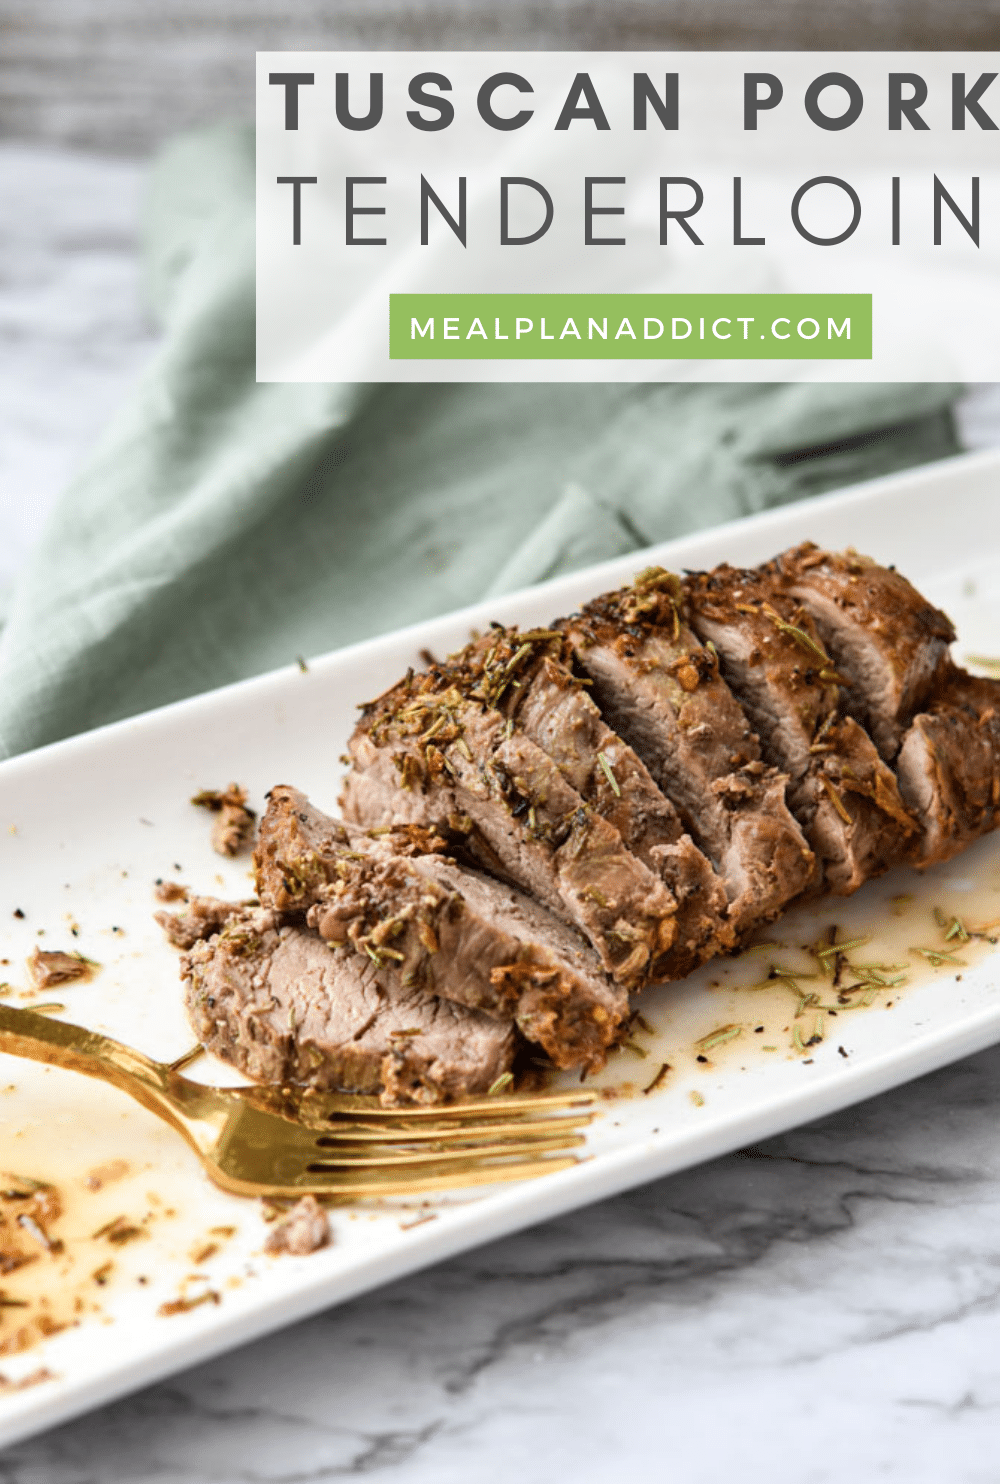 Easy Tuscan Pork Tenderloin Recipe   Meal Plan Addict